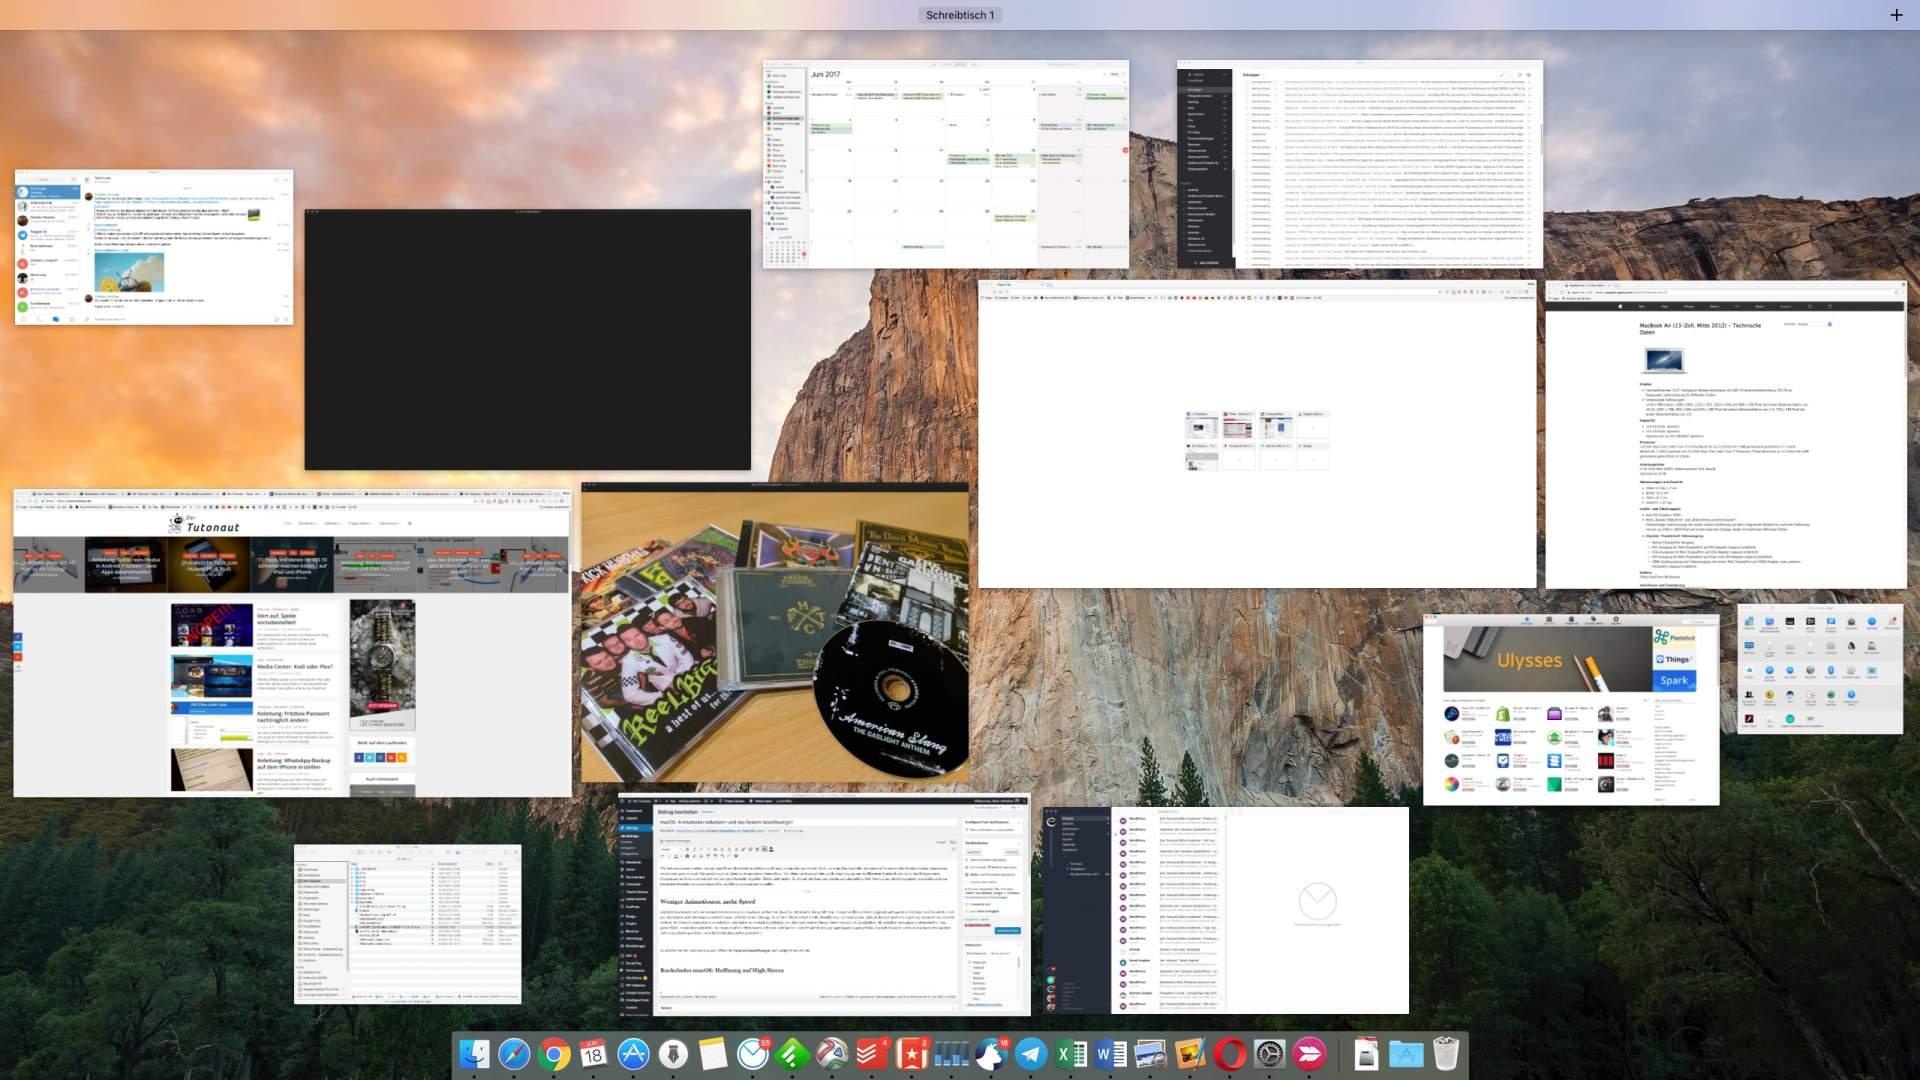 macOS Mission Control